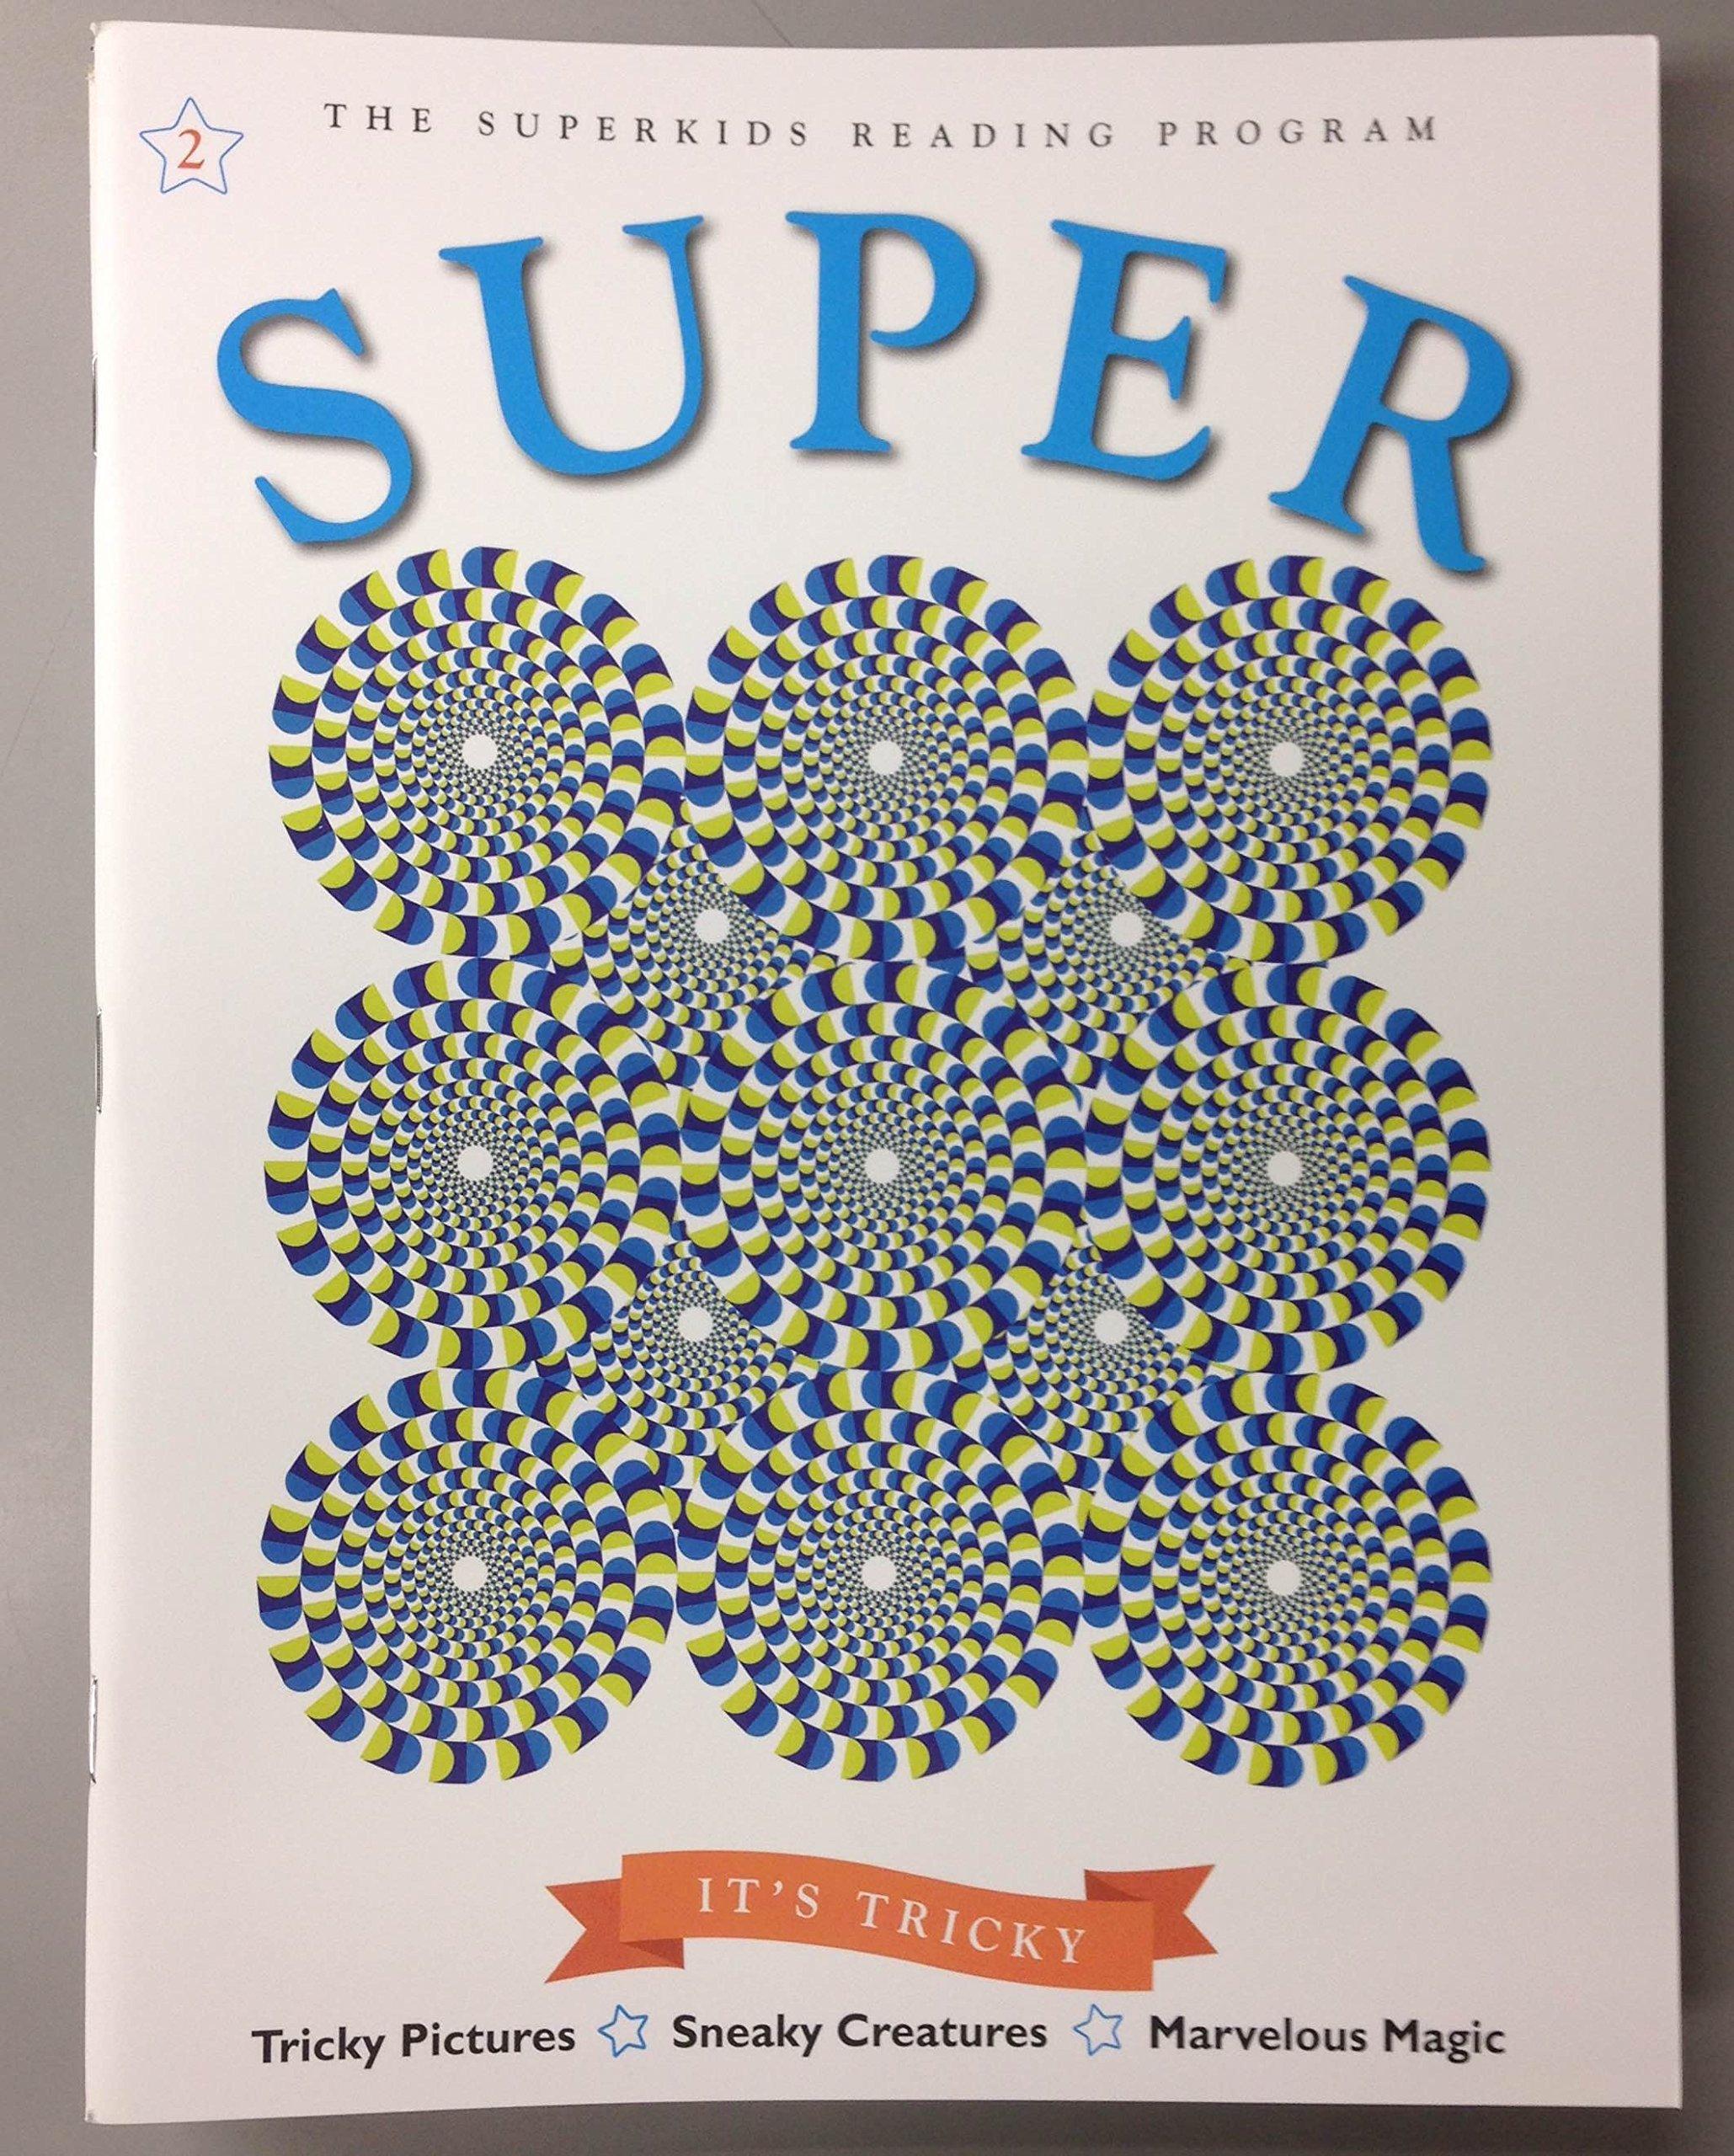 Fine Superkids Gallery - General Worksheet - cheapsilverjewelry.us